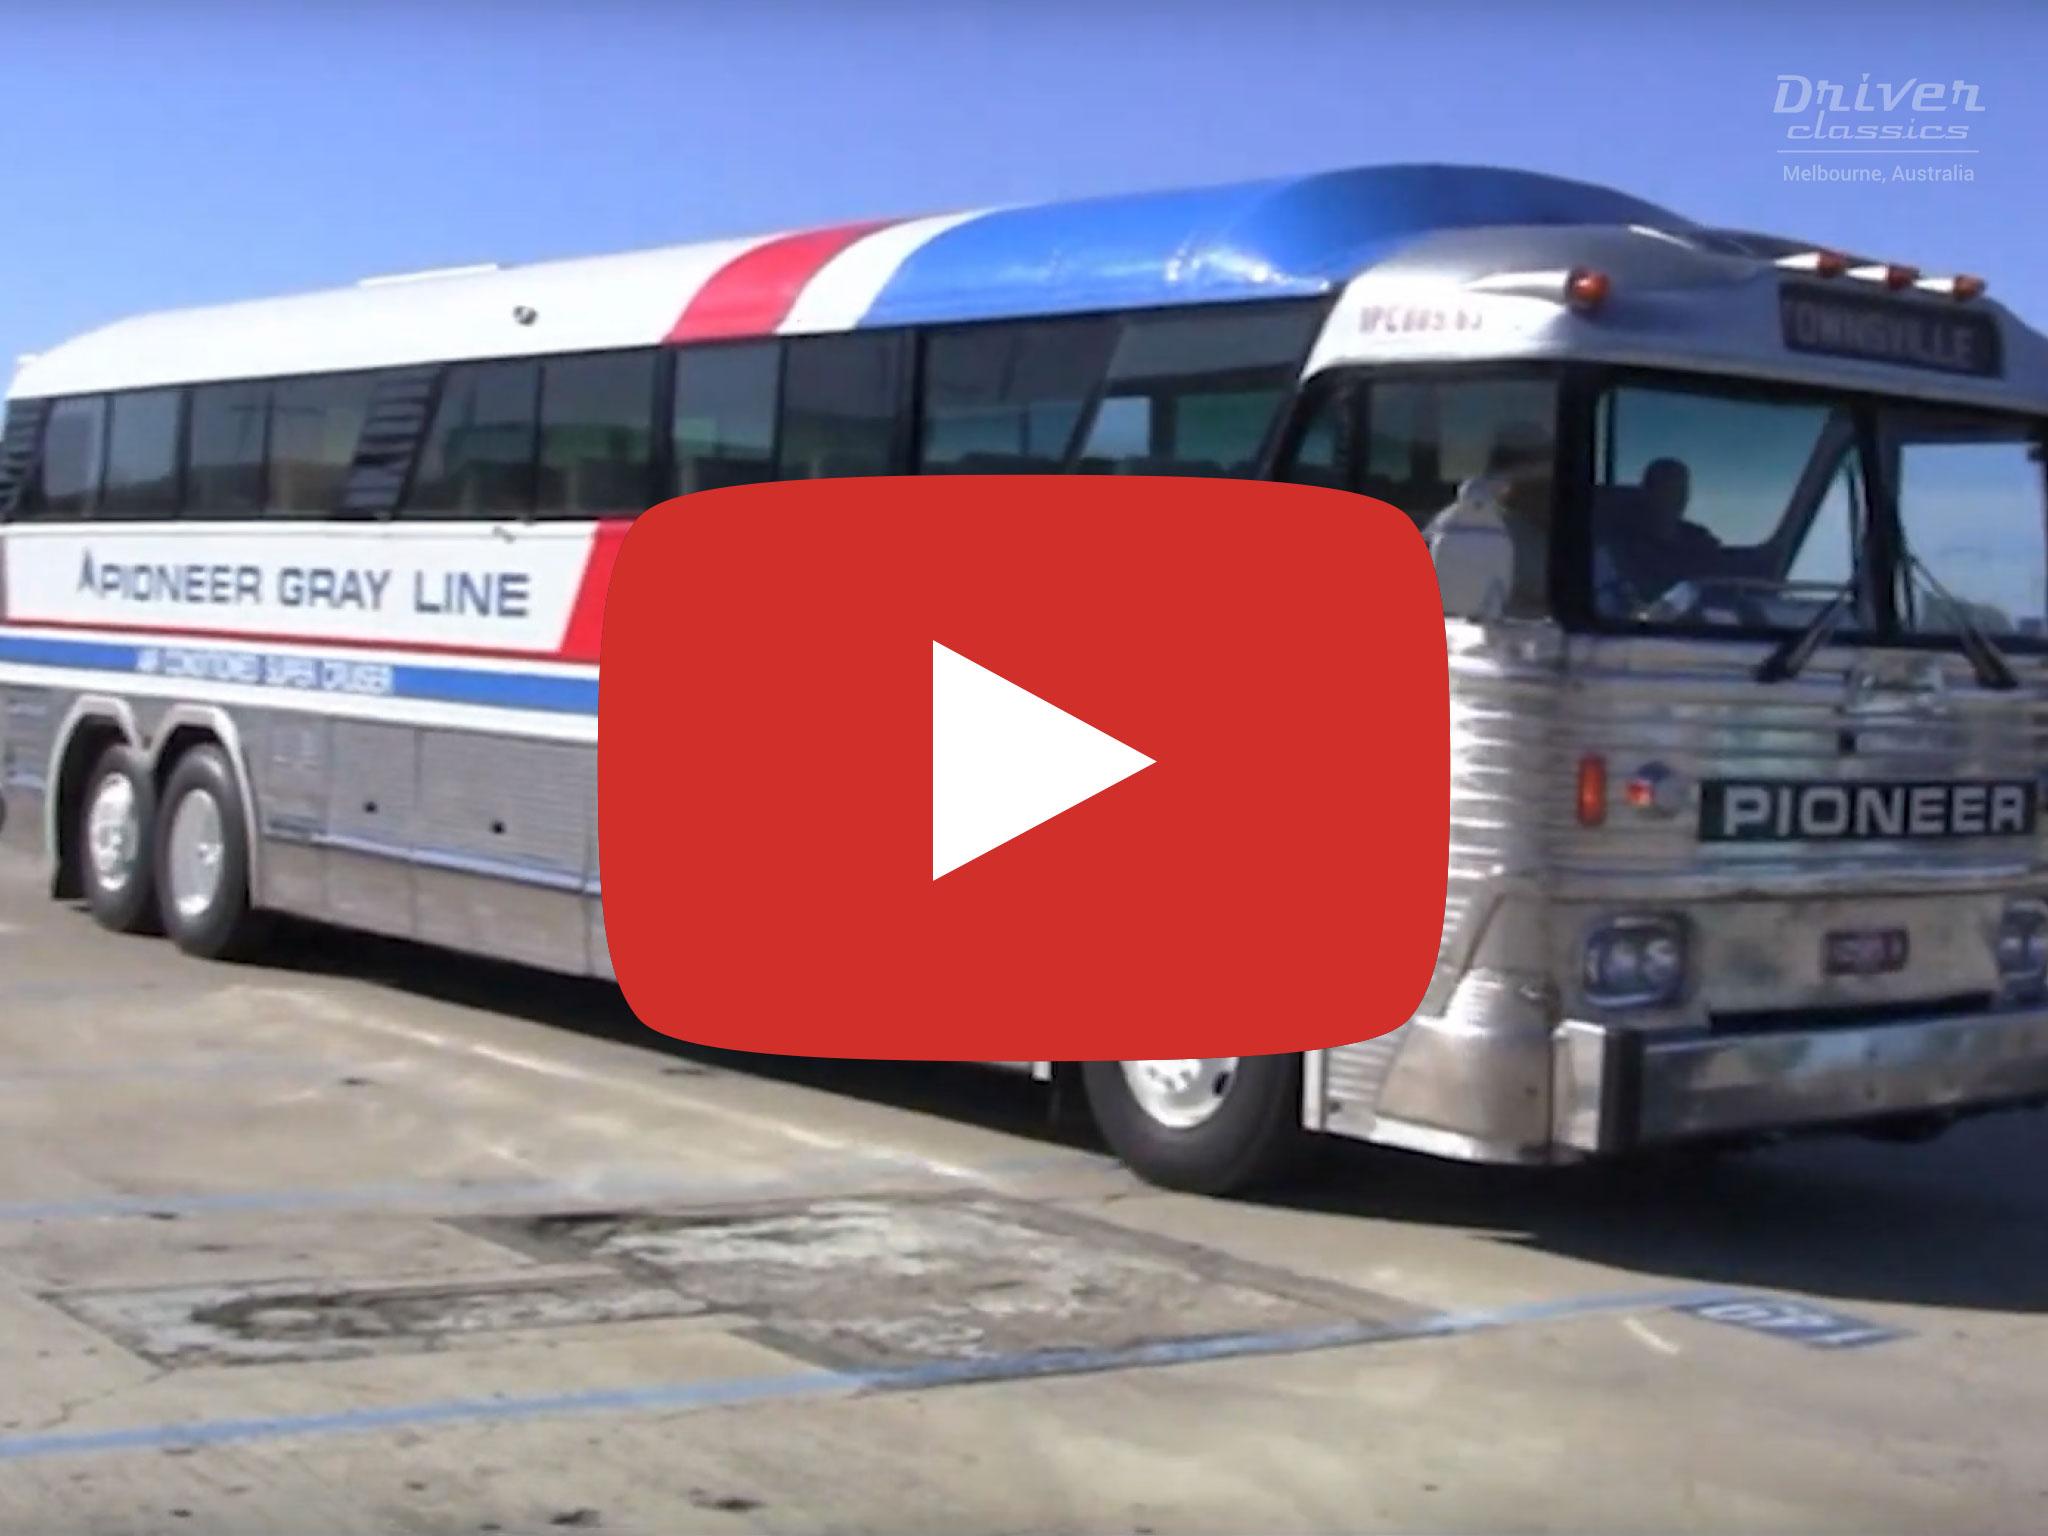 MCI MC7 bus 1972 Model, Melbourne VIC. Video by David Kemp in 2016